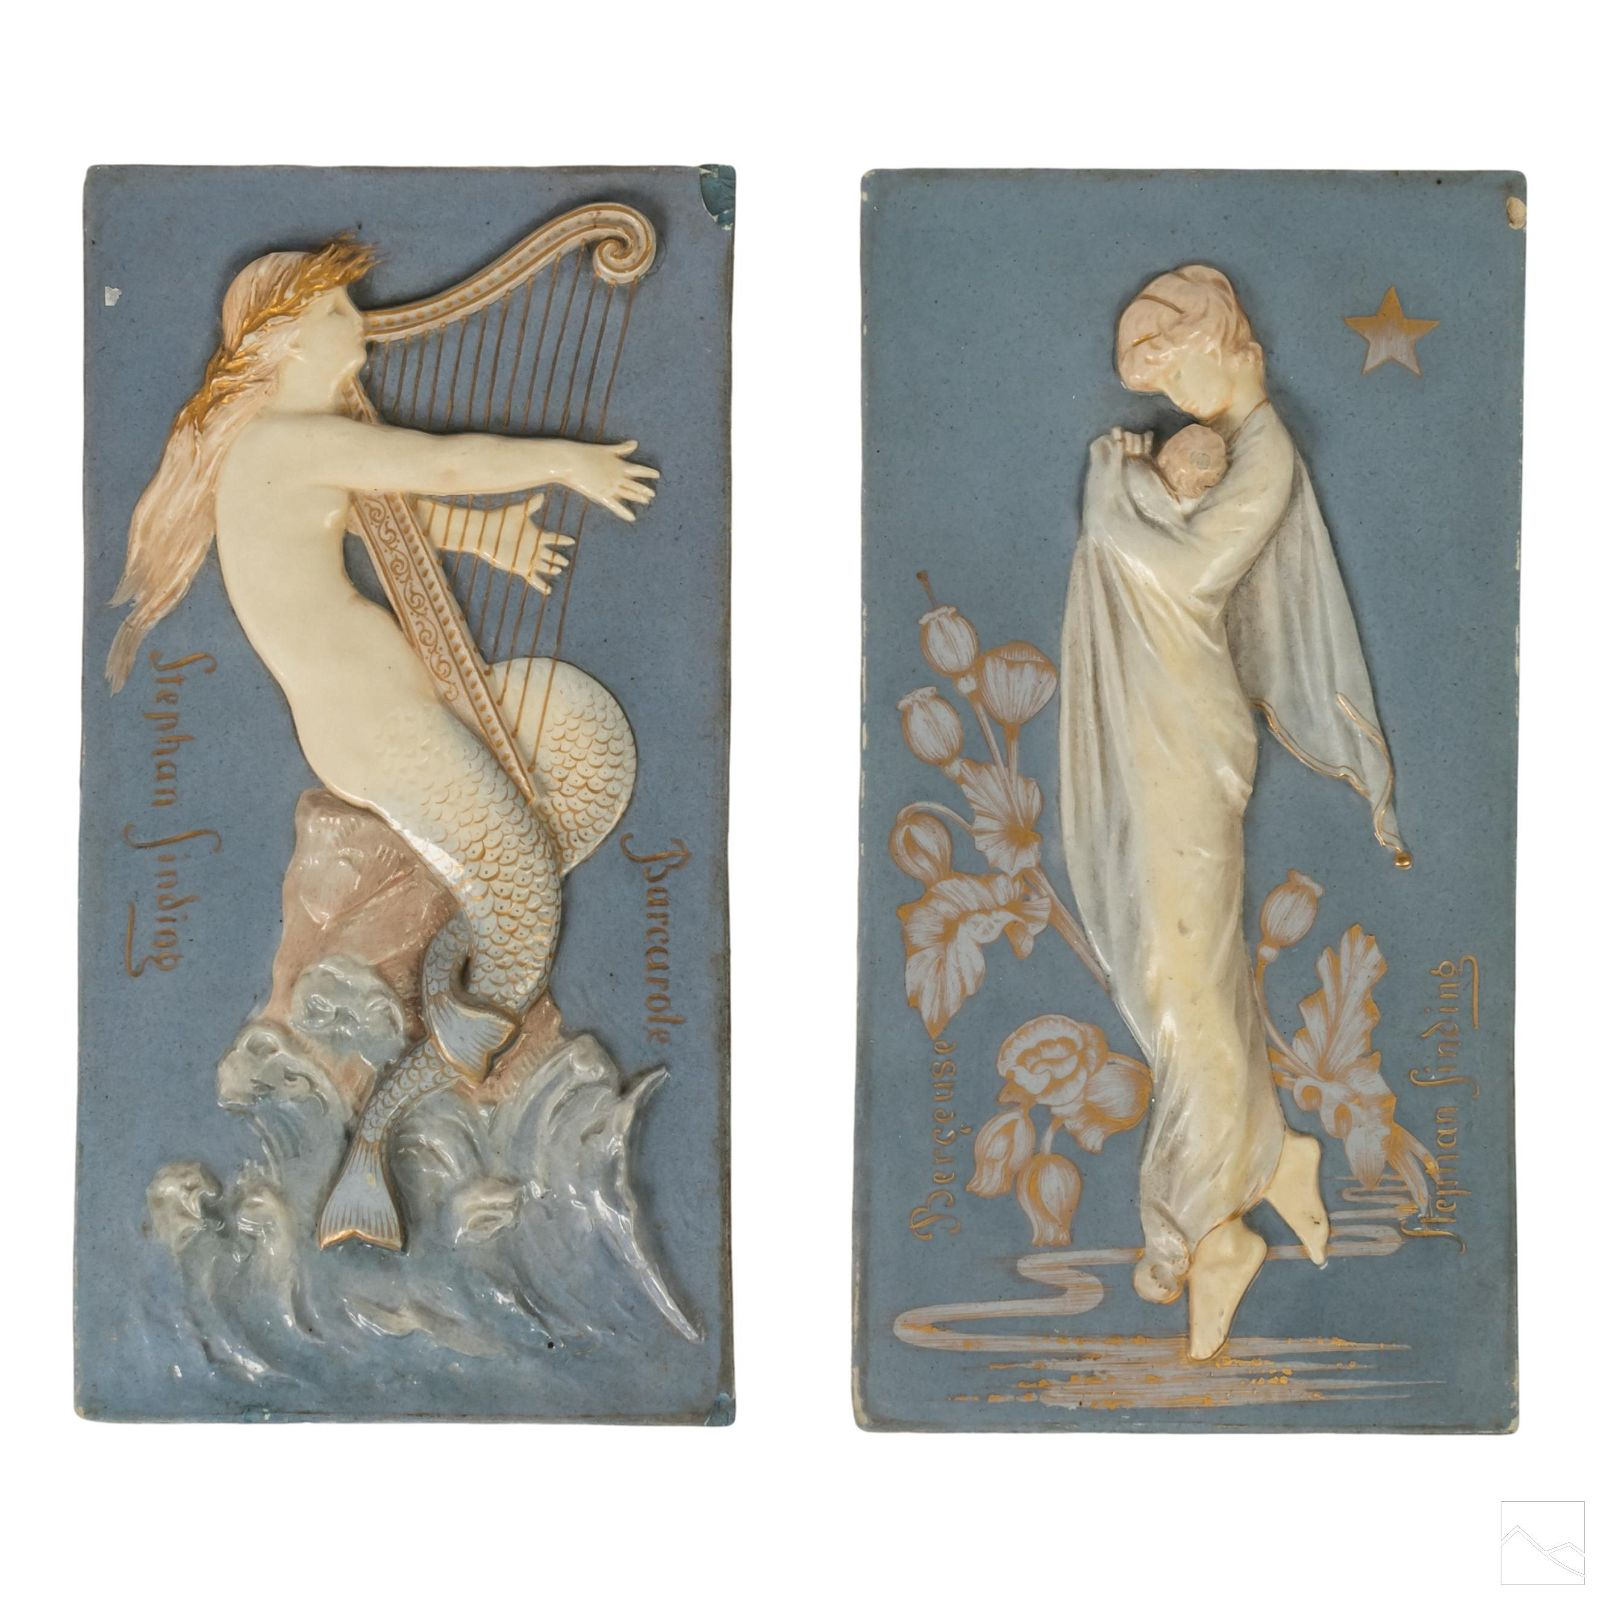 Stephan Sinding 1846-1922 Porcelain Relief Plaques